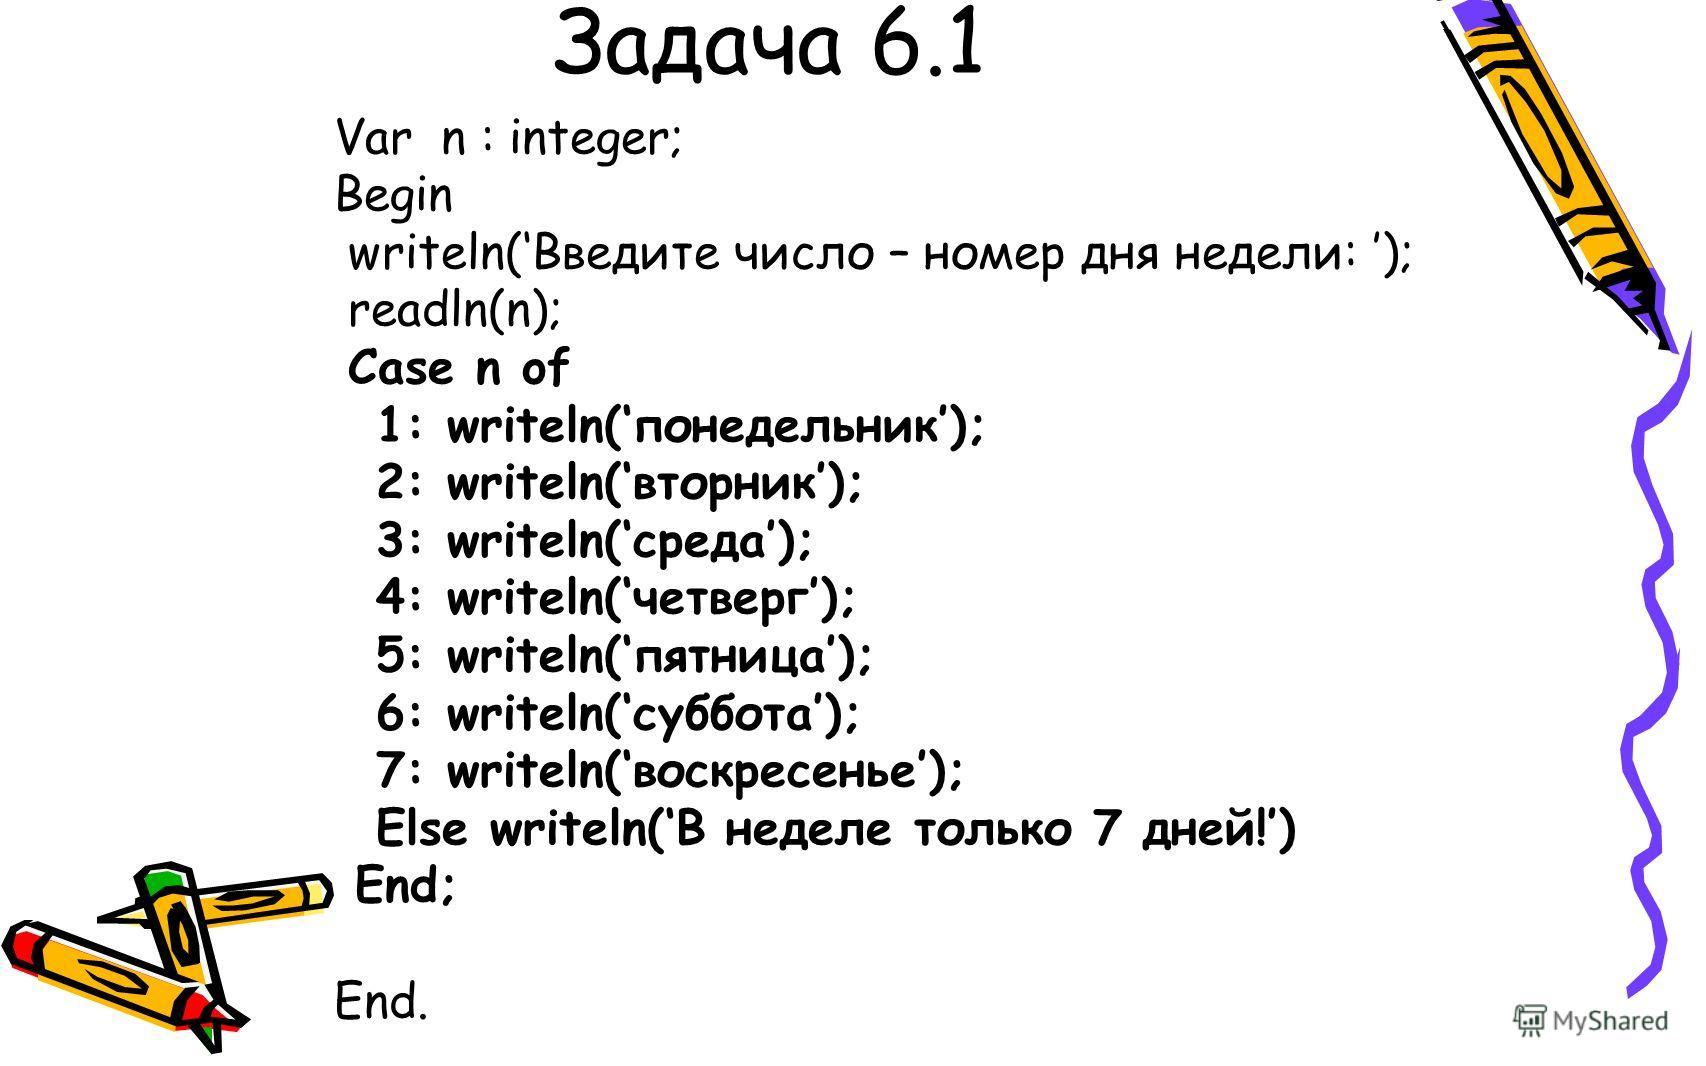 Задача 6.1 Var n : integer; Begin writeln(Введите число – номер дня недели: ); readln(n); Сase n of 1: writeln(понедельник); 2: writeln(вторник); 3: writeln(среда); 4: writeln(четверг); 5: writeln(пятница); 6: writeln(суббота); 7: writeln(воскресенье